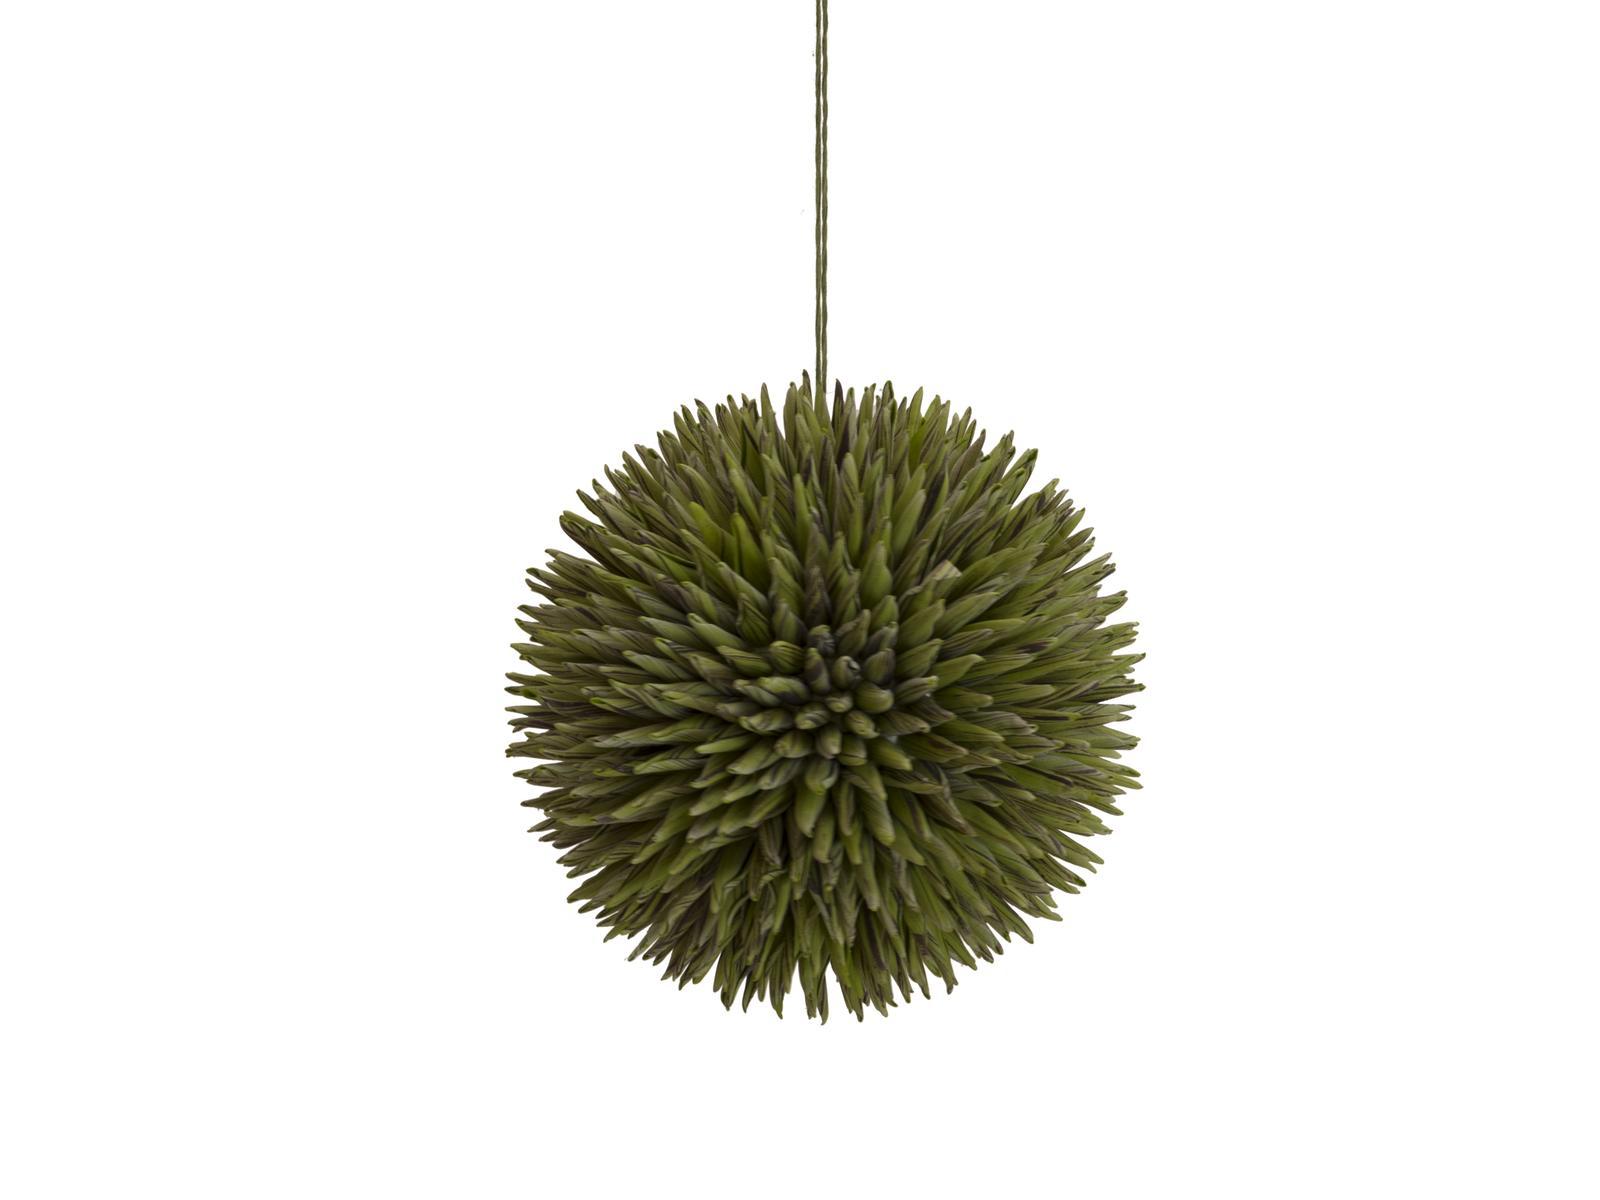 Sukulent koule (EVA), zelená, 20 cm